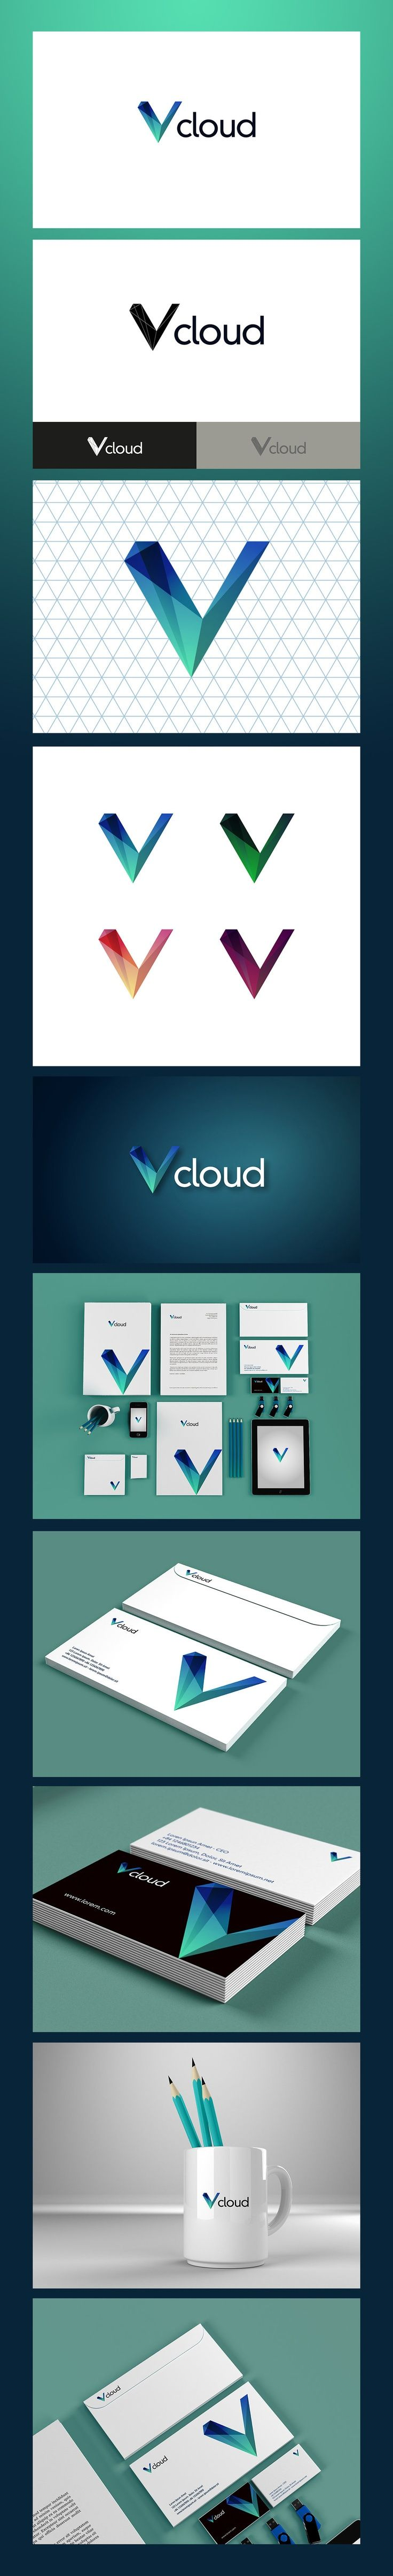 Vcloud #Branding,